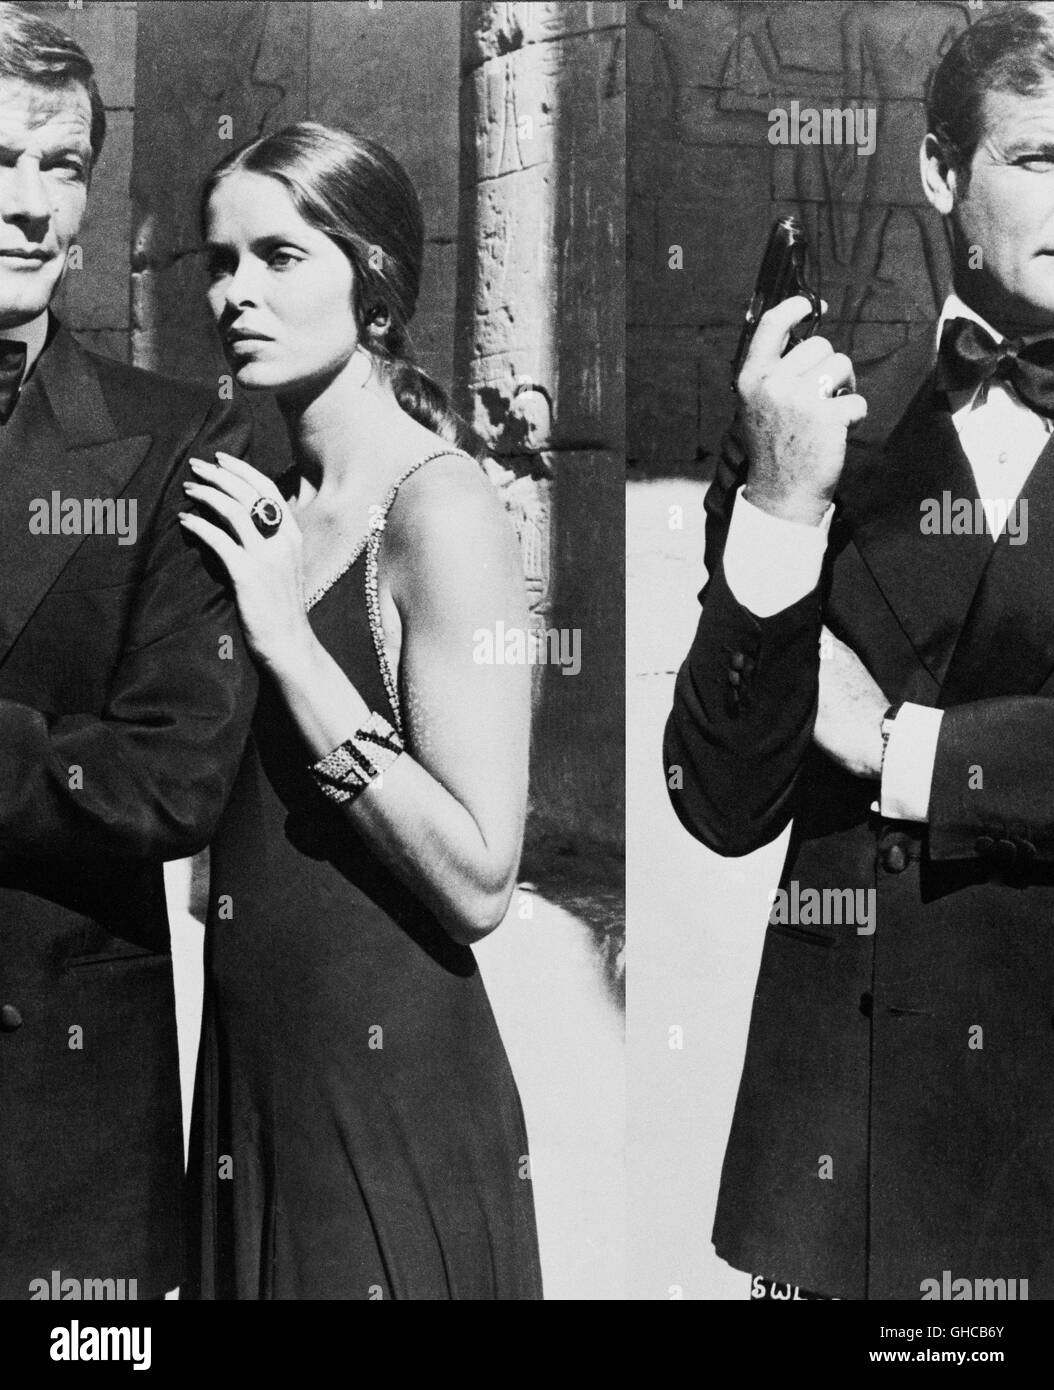 DER, DER MICH LIEBTE SPION La espía que me amó UK/USA 1977 Lewis Gilbert Roger Moore (James Bond), Barbra BACH (Anya Foto de stock